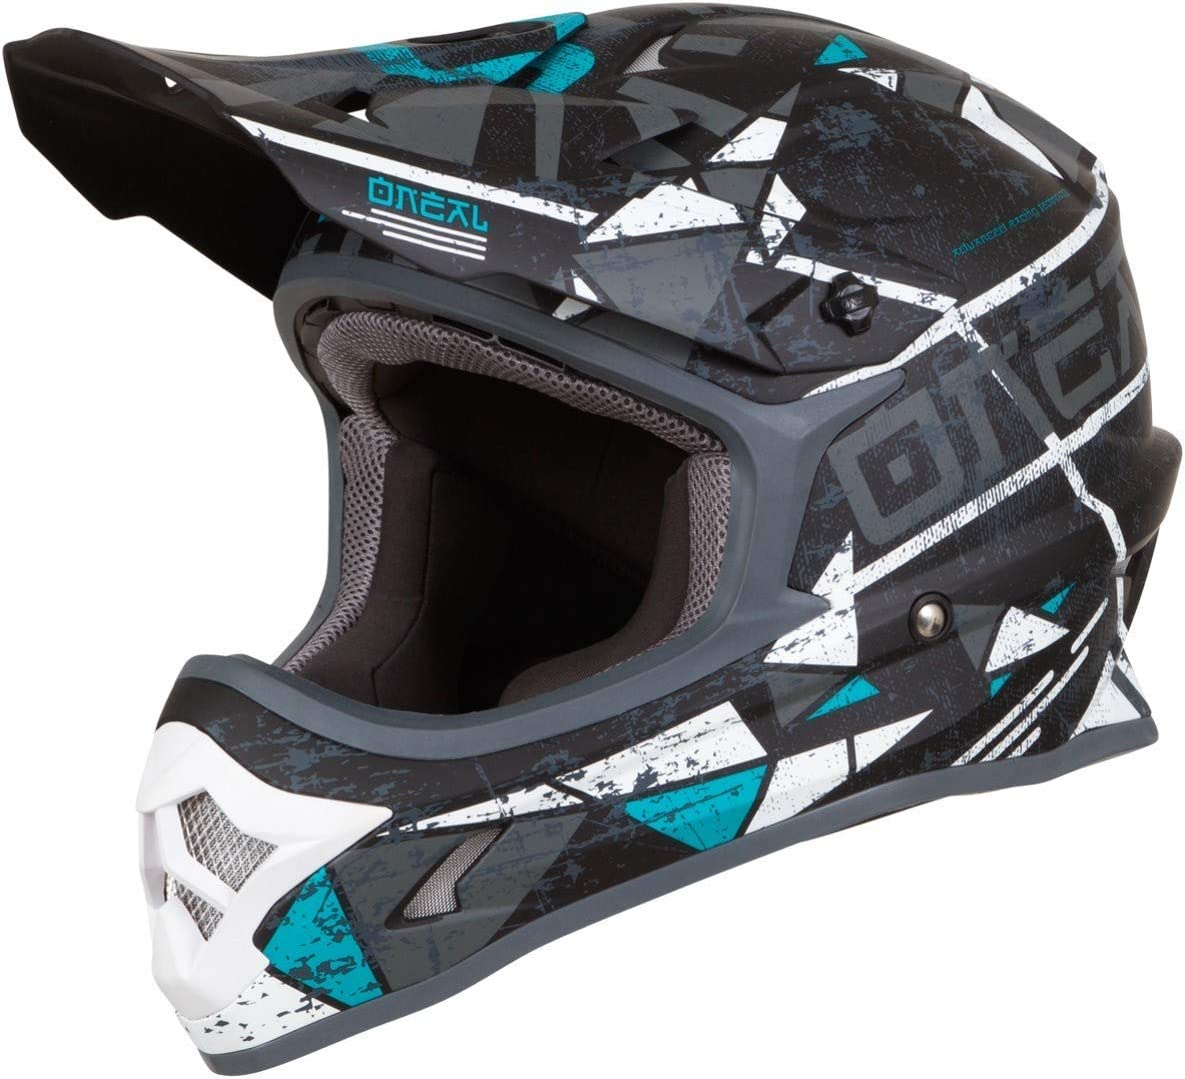 Los Angeles Mall O'Neal 3Series Popular brand Zen Motocross Helm MX FR MTB All Mountain Bike DH